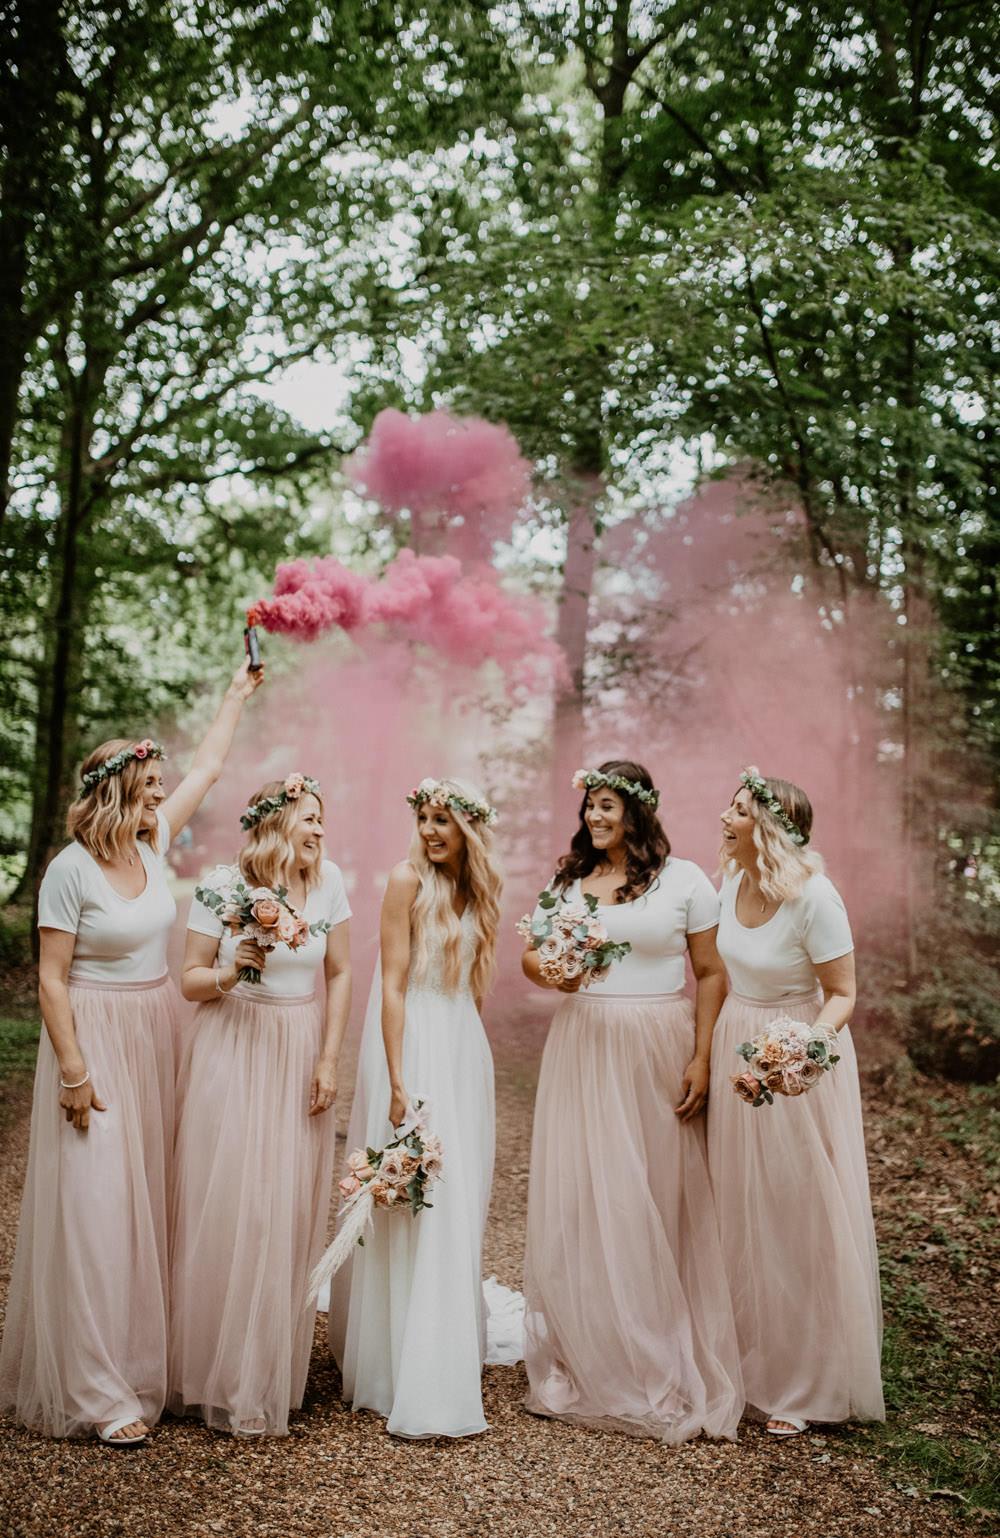 Bridesmaids Bridesmaid Dress Dresses Pink Skirt Top Smoke Bomb Whimsical Boho Wedding Camilla Andrea Photography